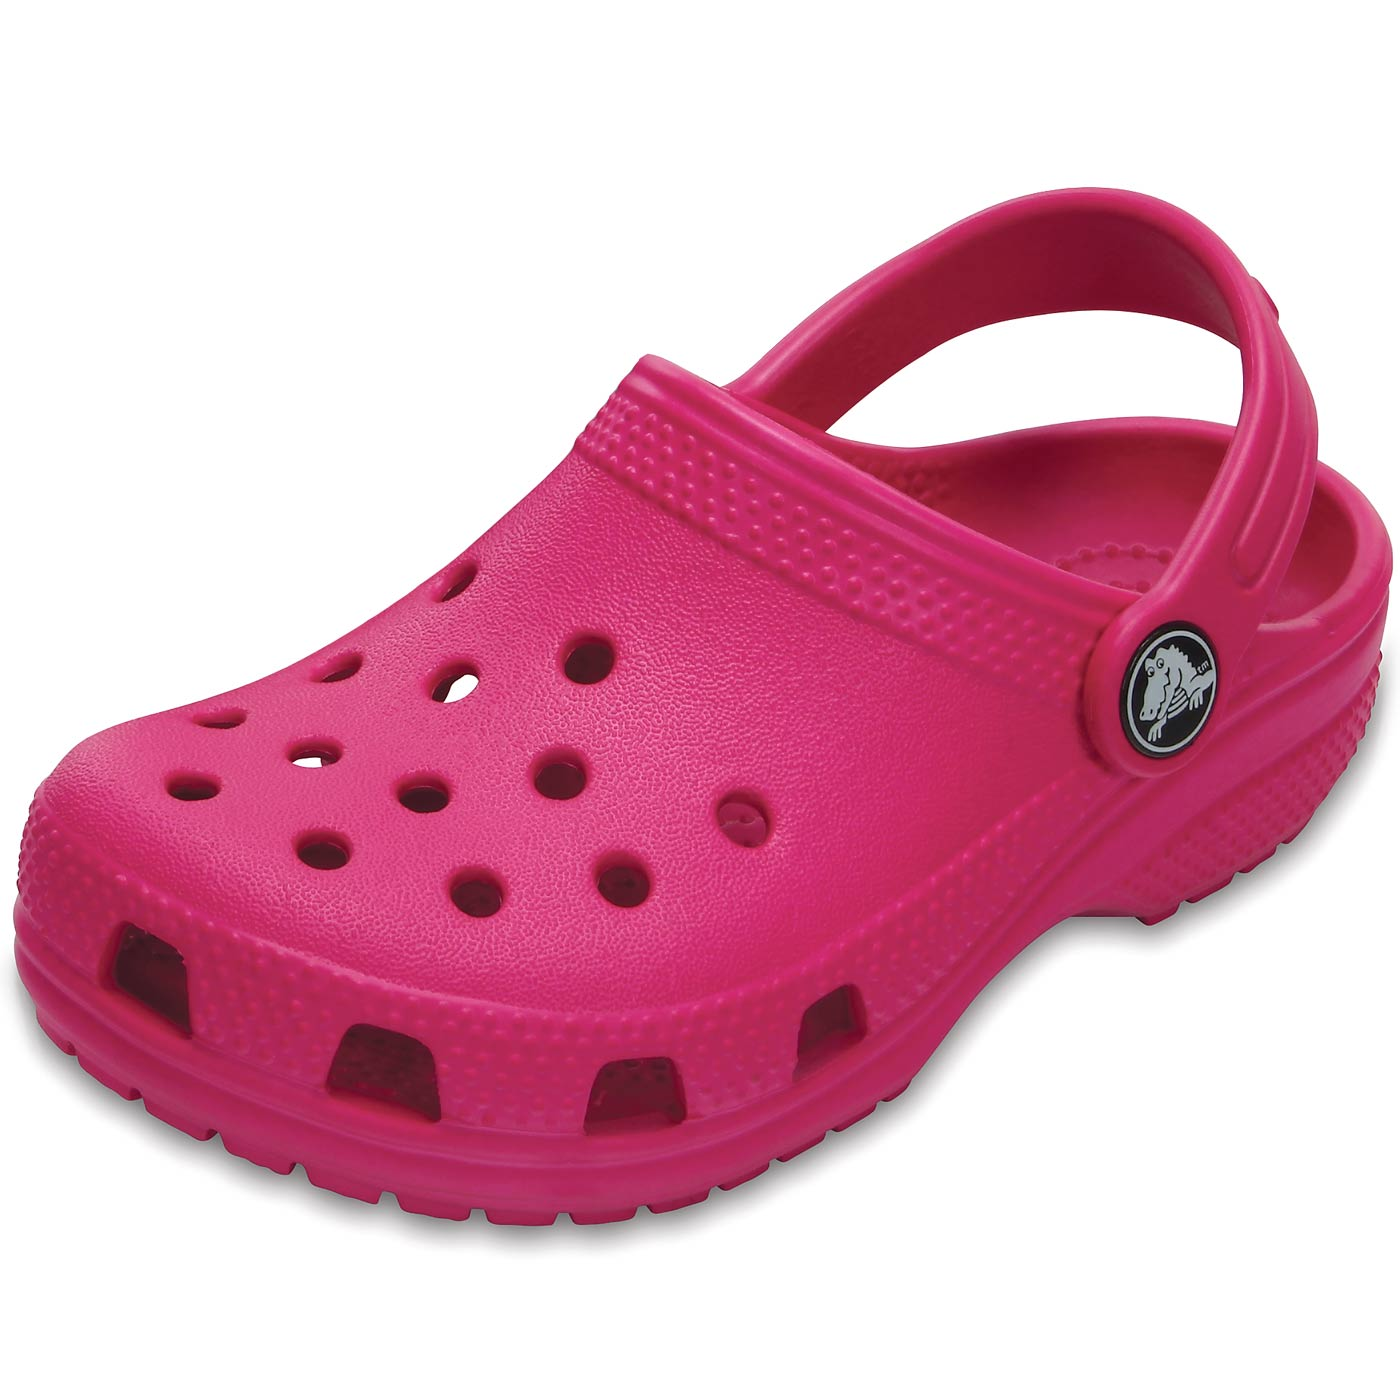 Crocs Kids Clogs